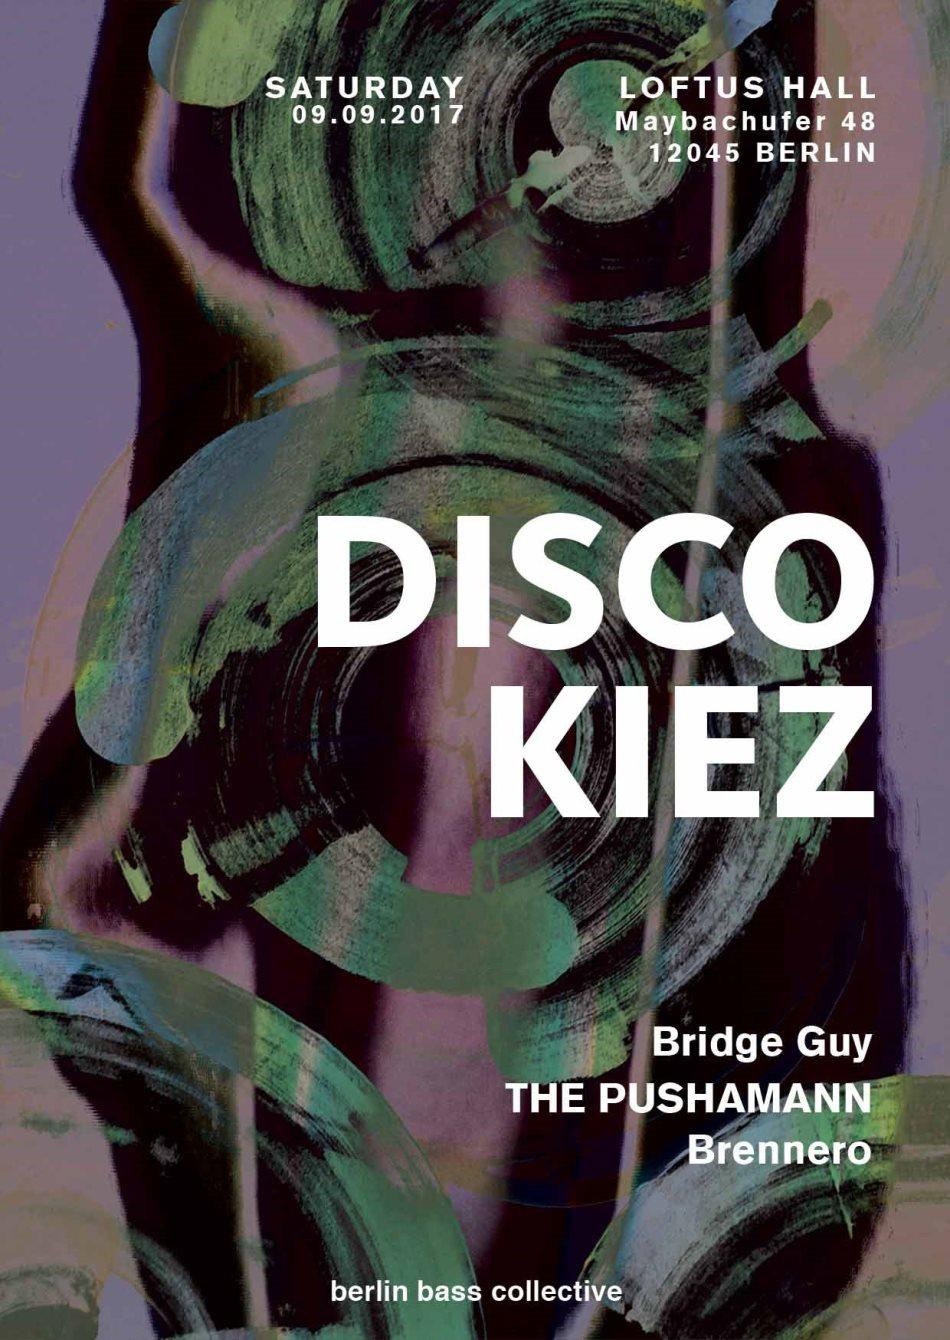 Disco Kiez - Flyer front